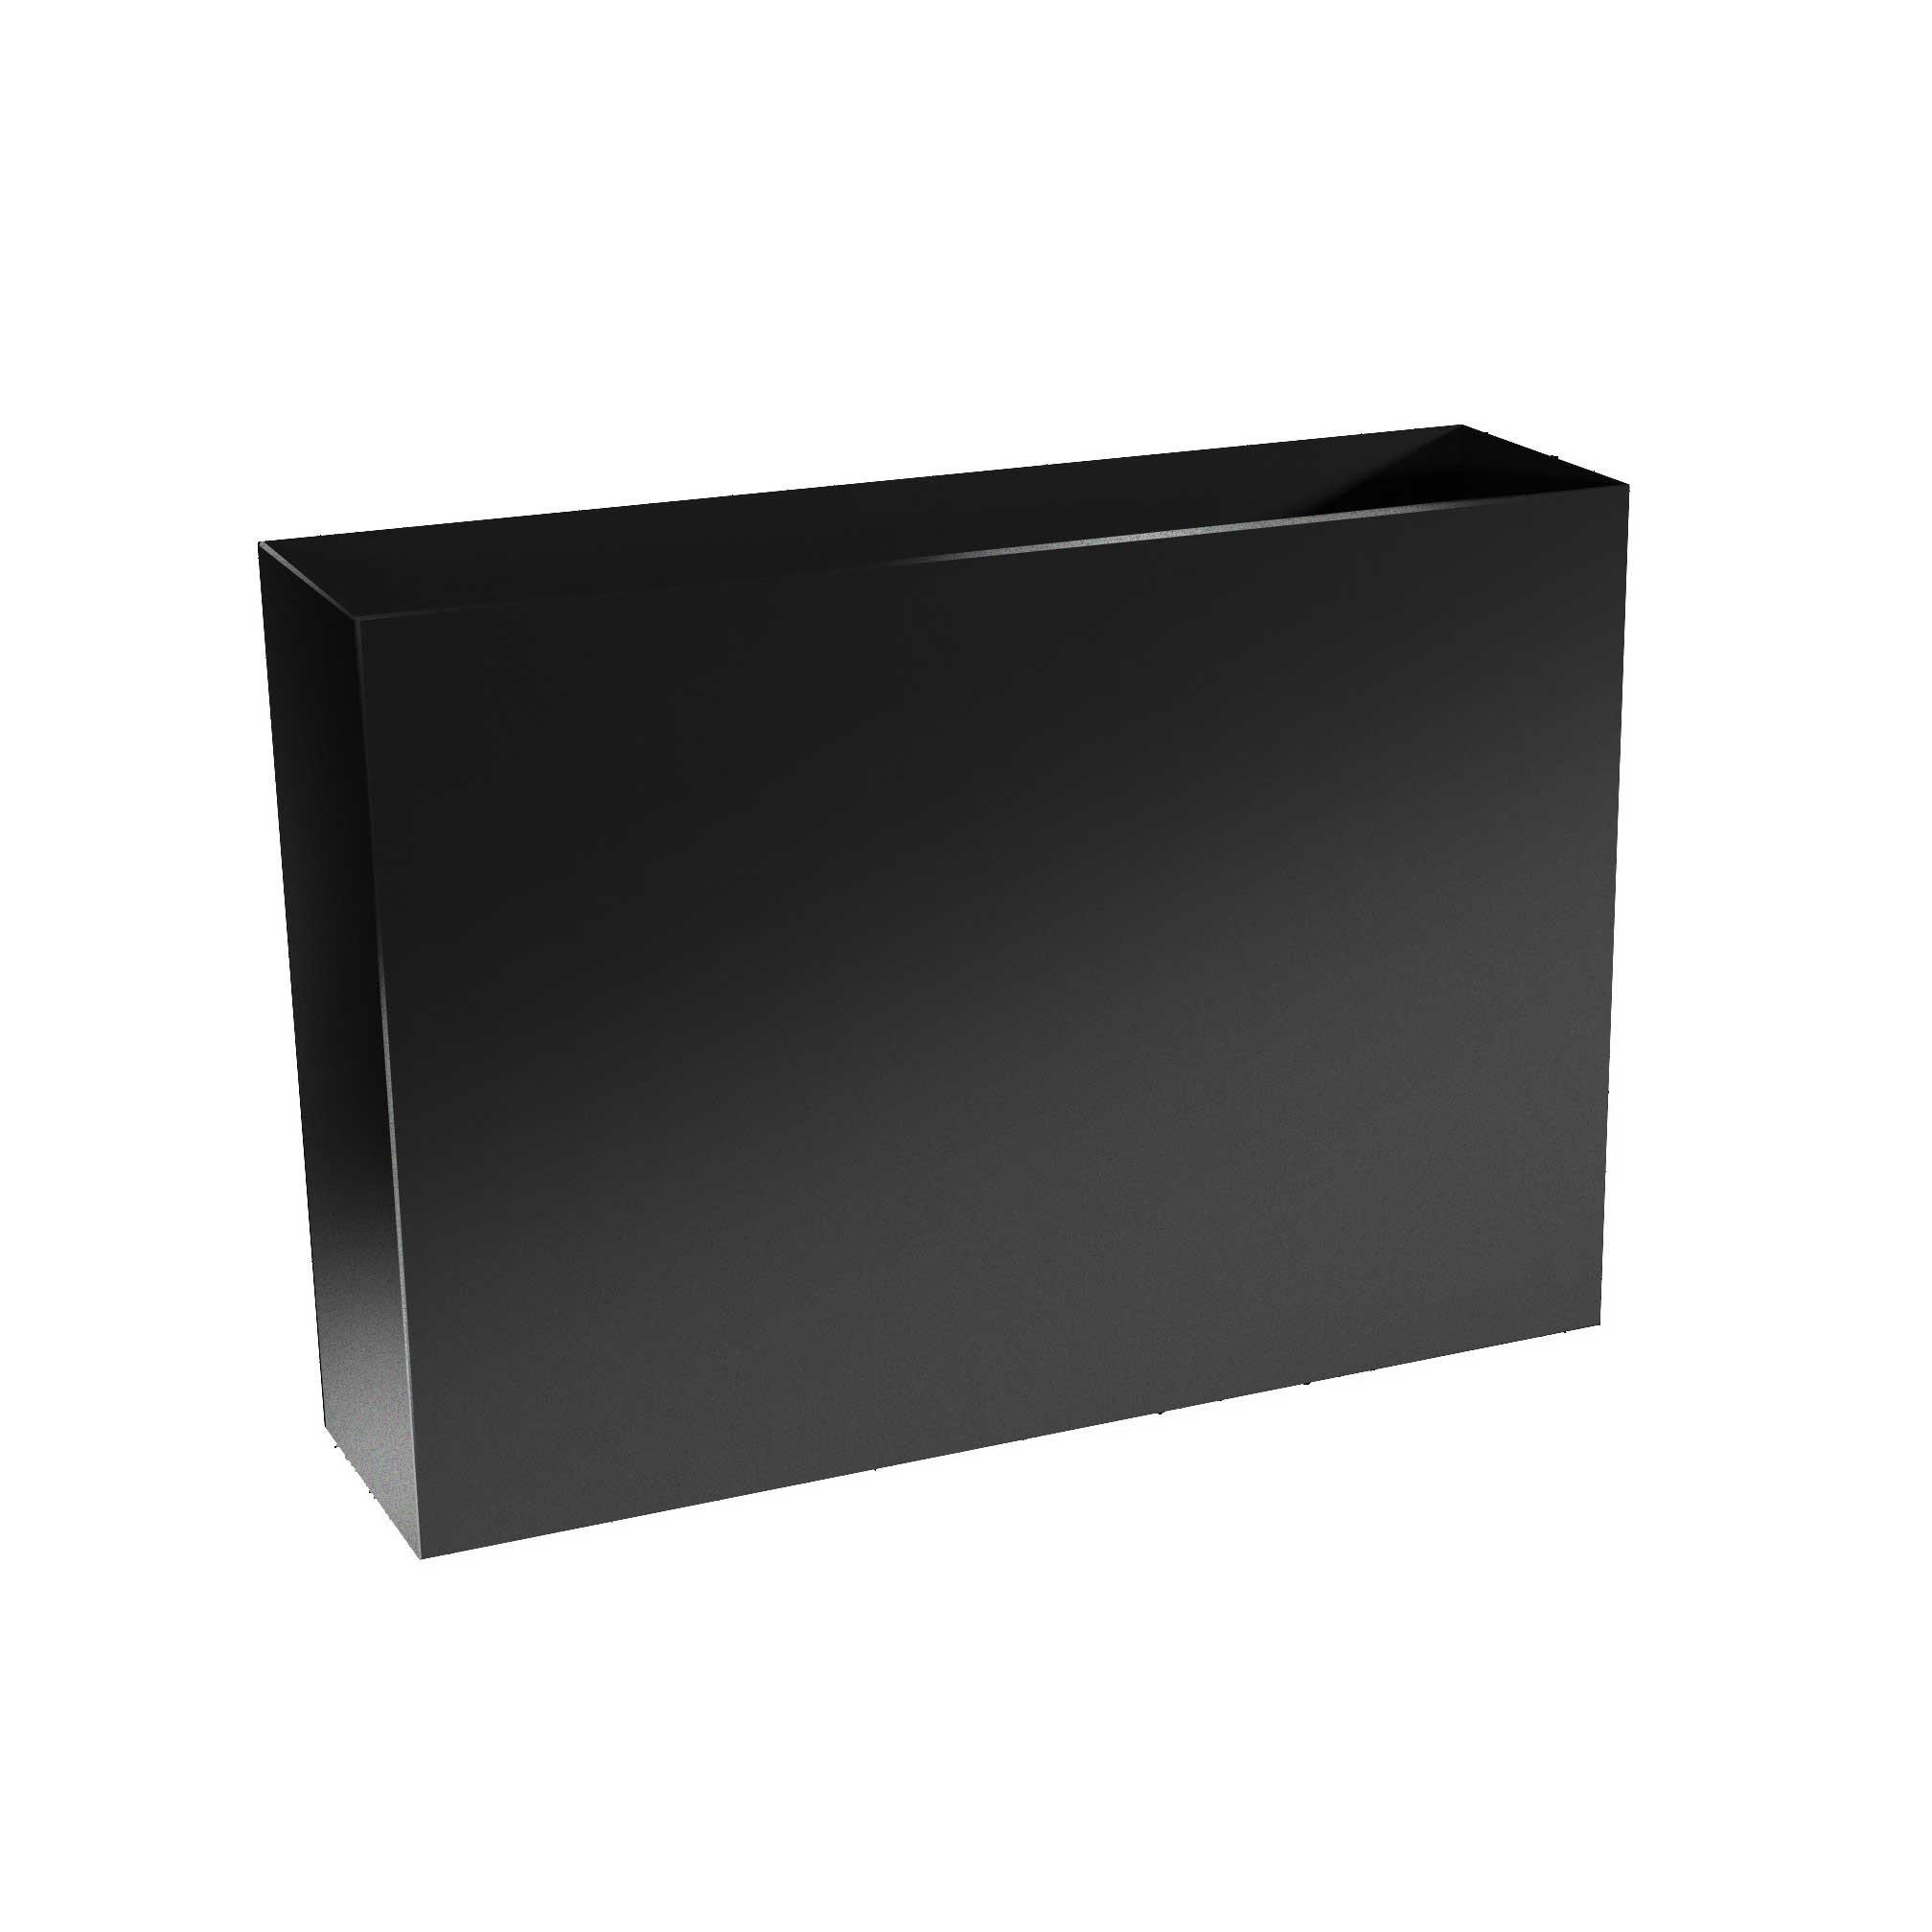 Modern Metal Divider Planter Boxes - 32' Tall, (32'/36'/40'/46'/60'/72' Length; 12' Width)